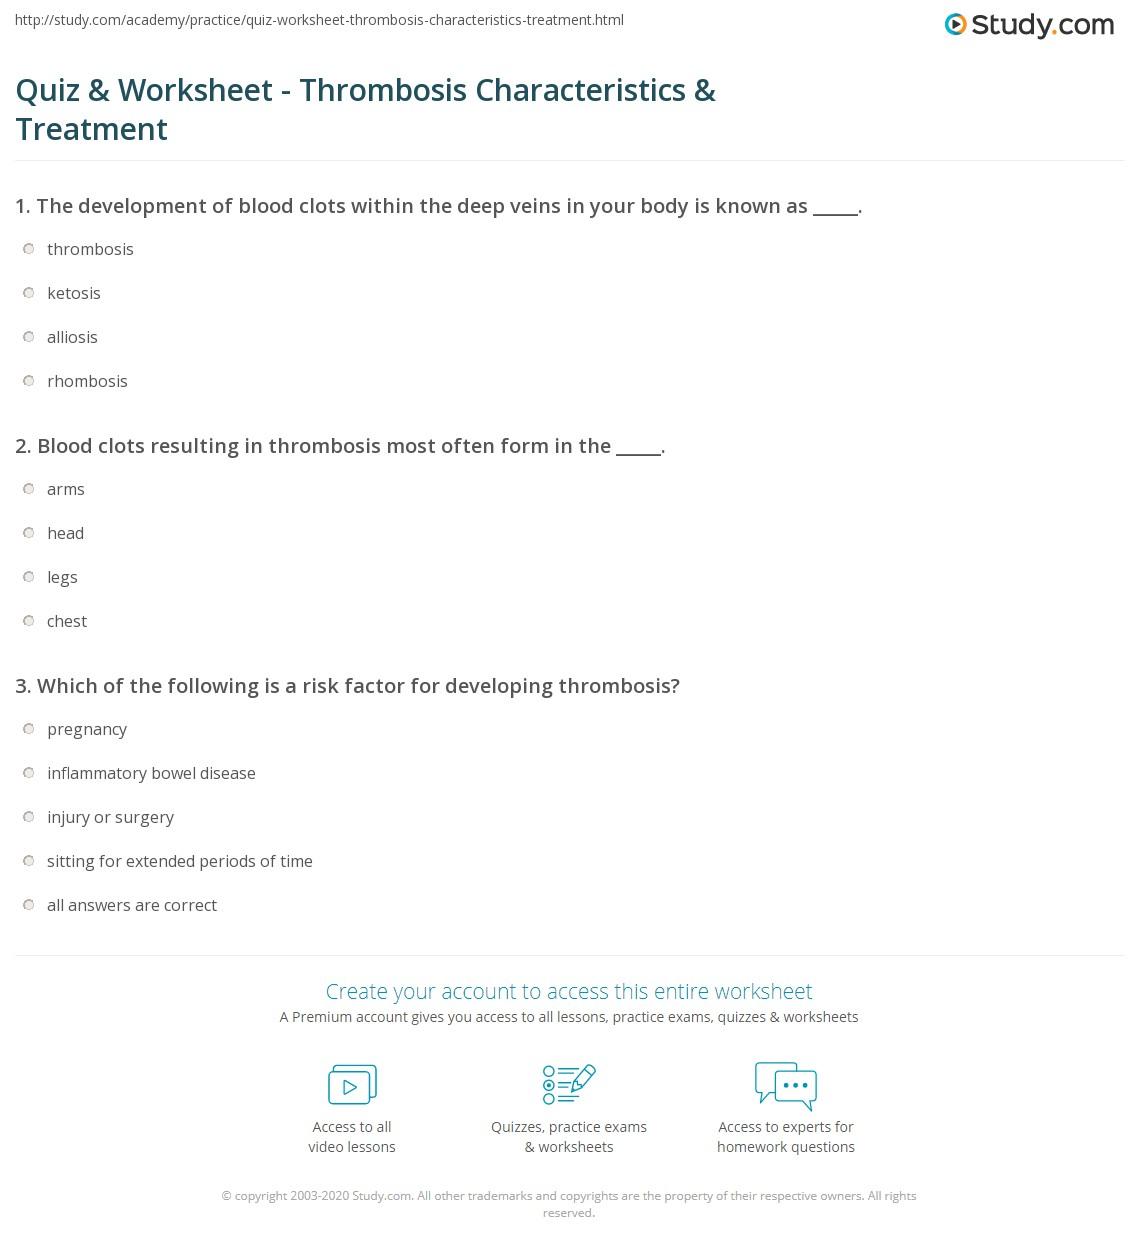 quiz & worksheet - thrombosis characteristics & treatment | study